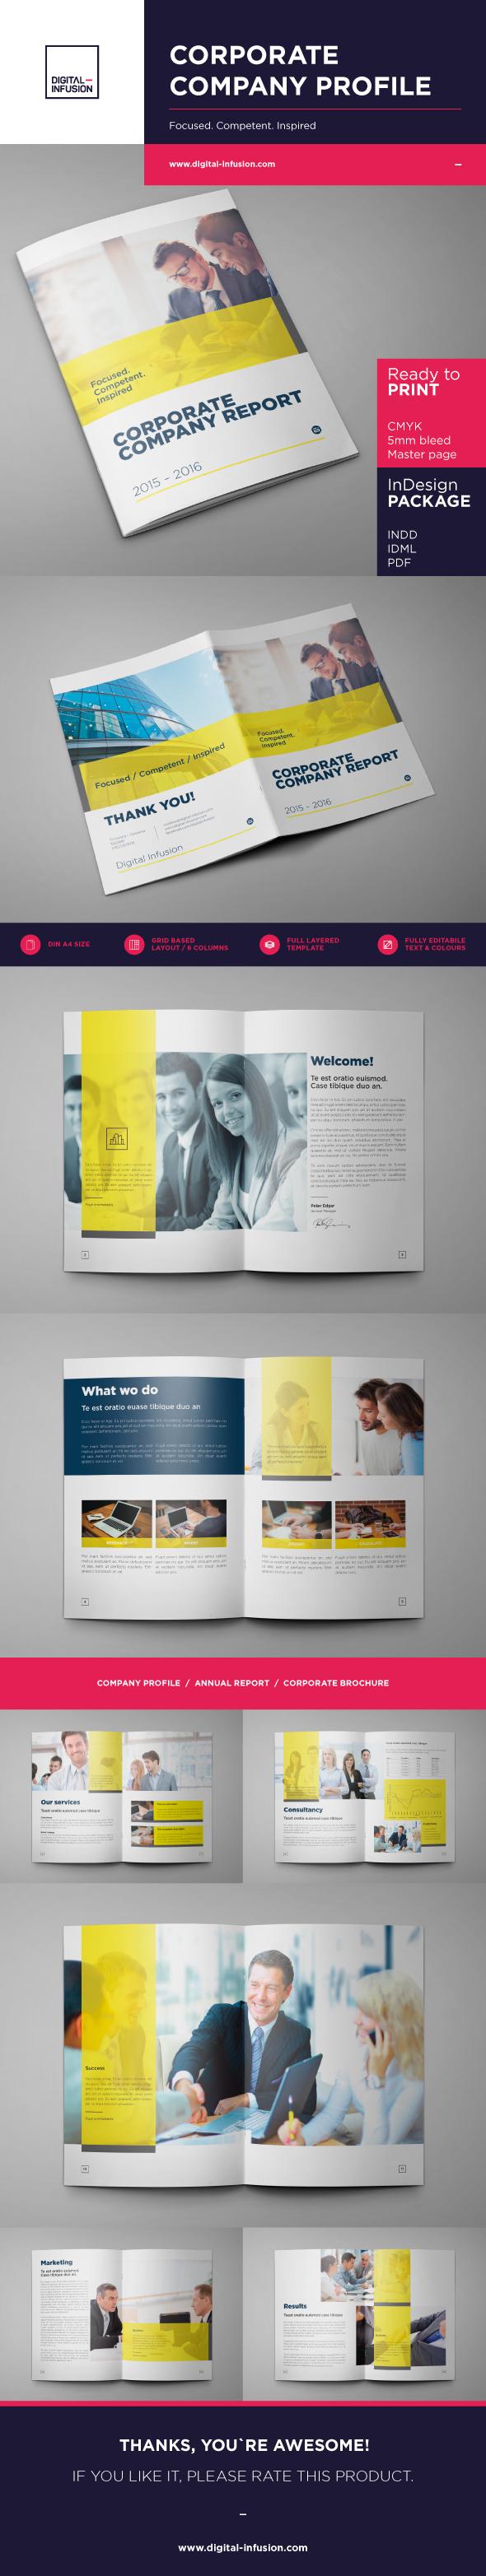 Corporate Company Profile example image 2